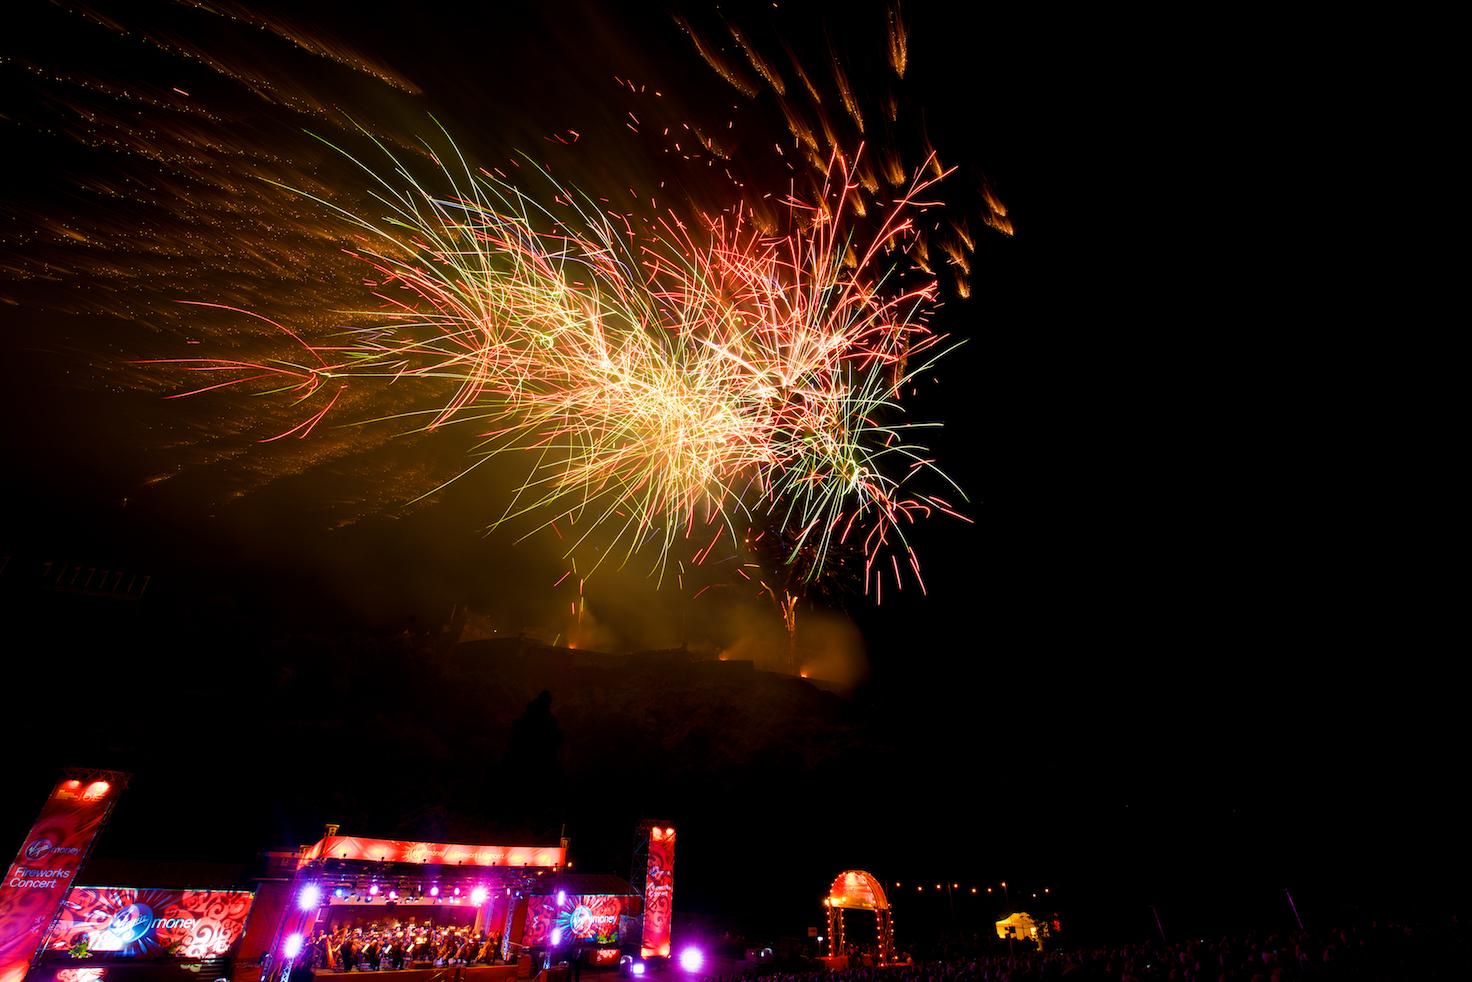 virgin-money-fireworks-concert-edinburgh-castleedinburgh-international-festival-edinburgh-castle-29th-august-2016-8